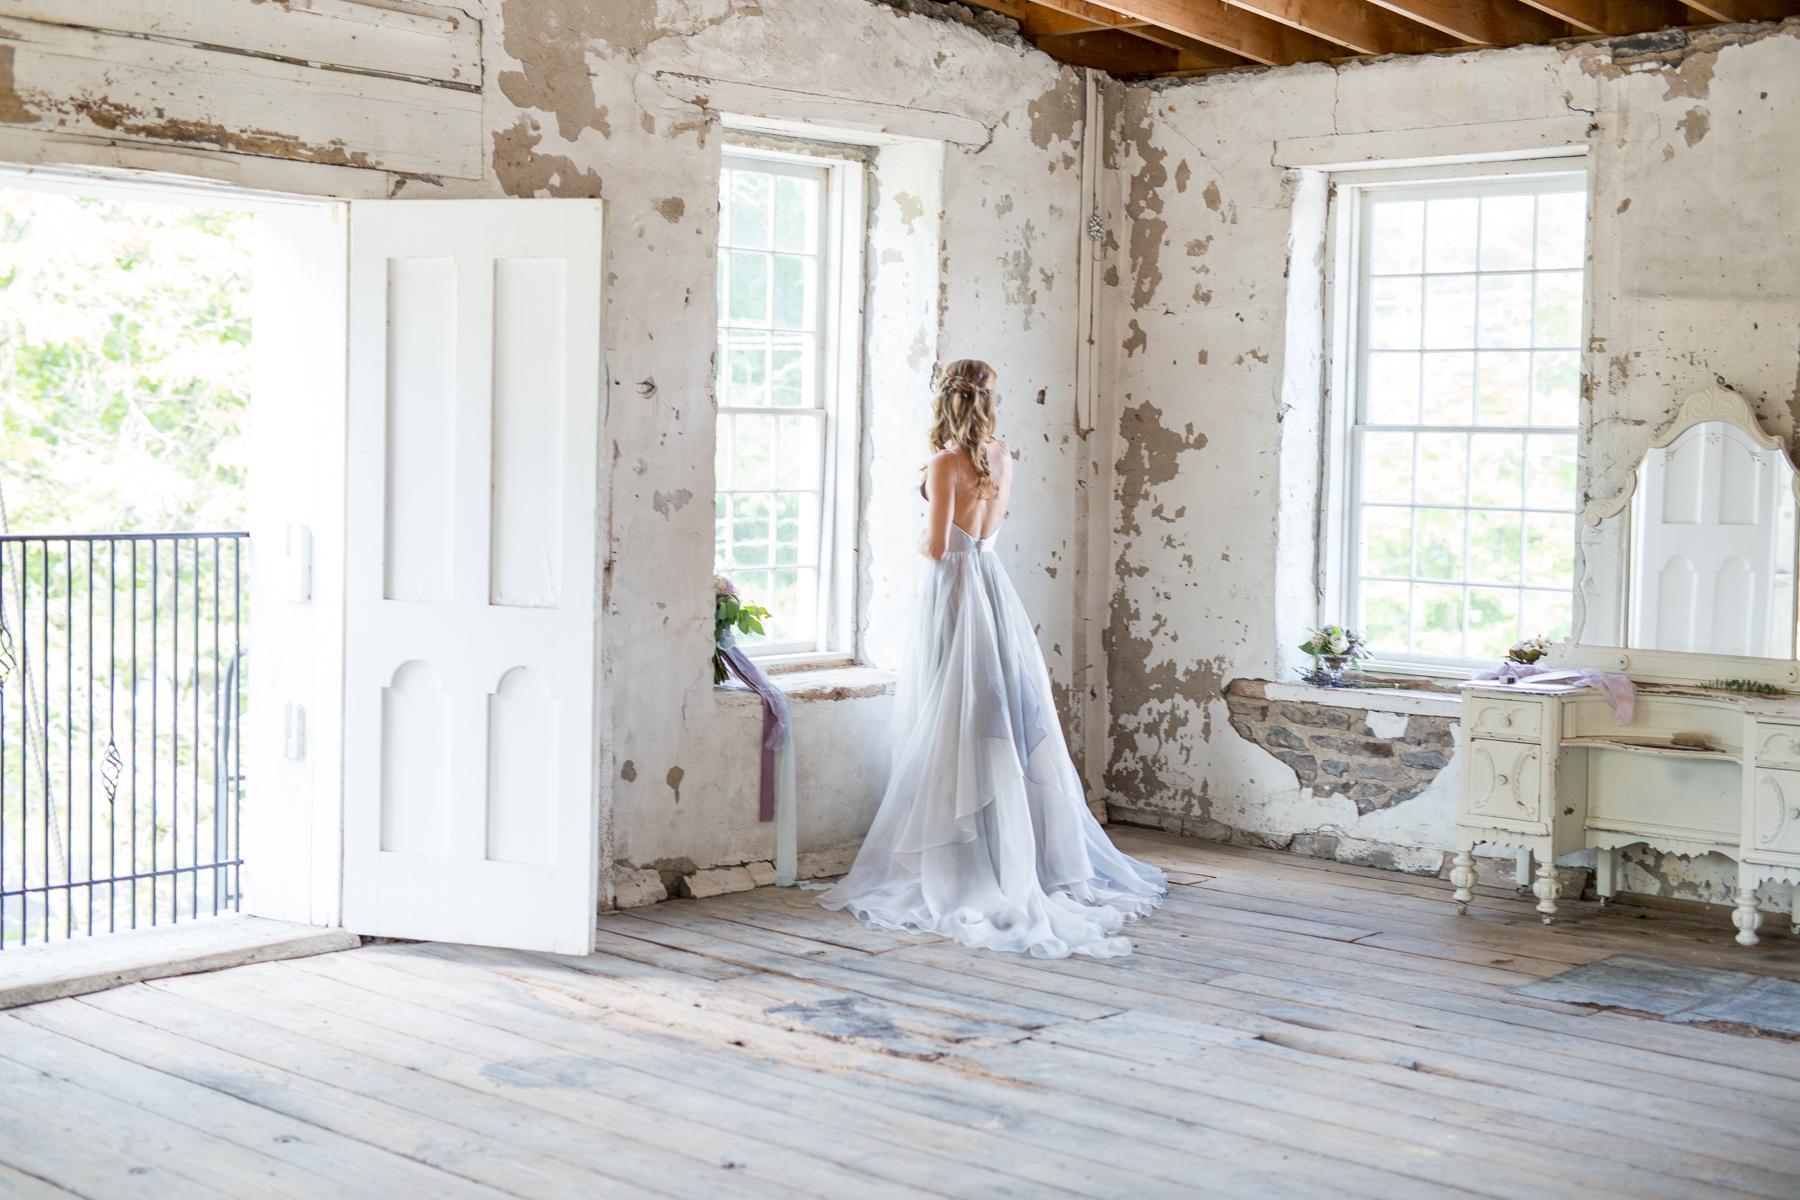 Nick-Natasha-Studio-Styled-Wedding-Sinclair-of-Skaneateles-NY-972.jpg